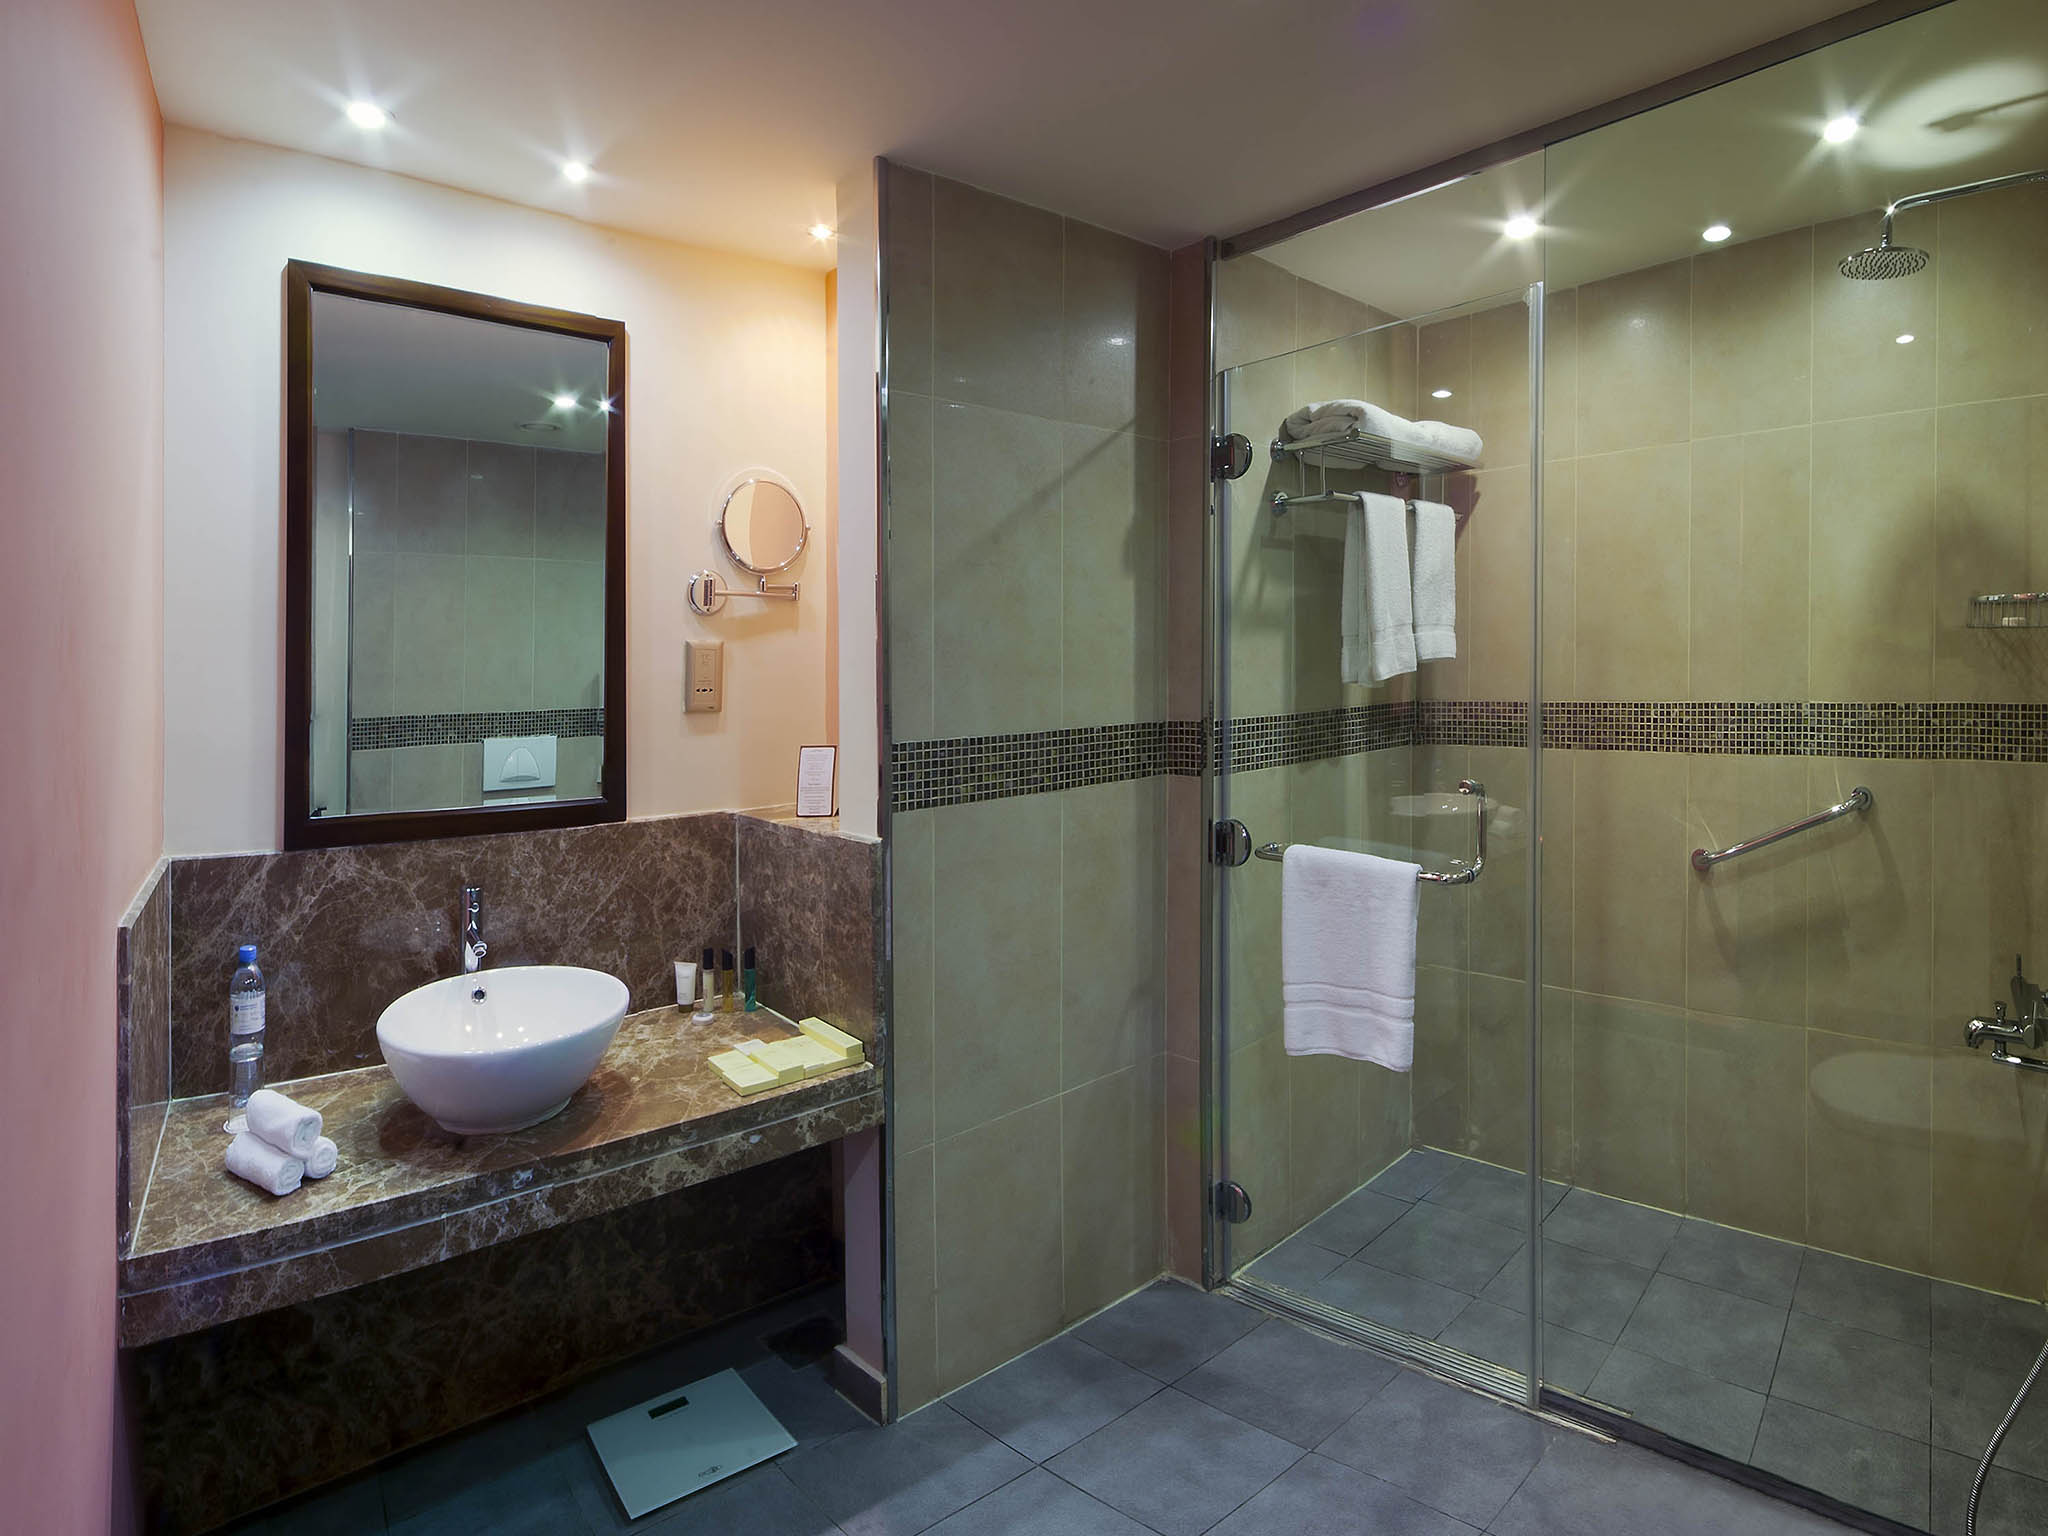 بالصور حمامات فنادق , افخم حمامات الفنادق 4881 10